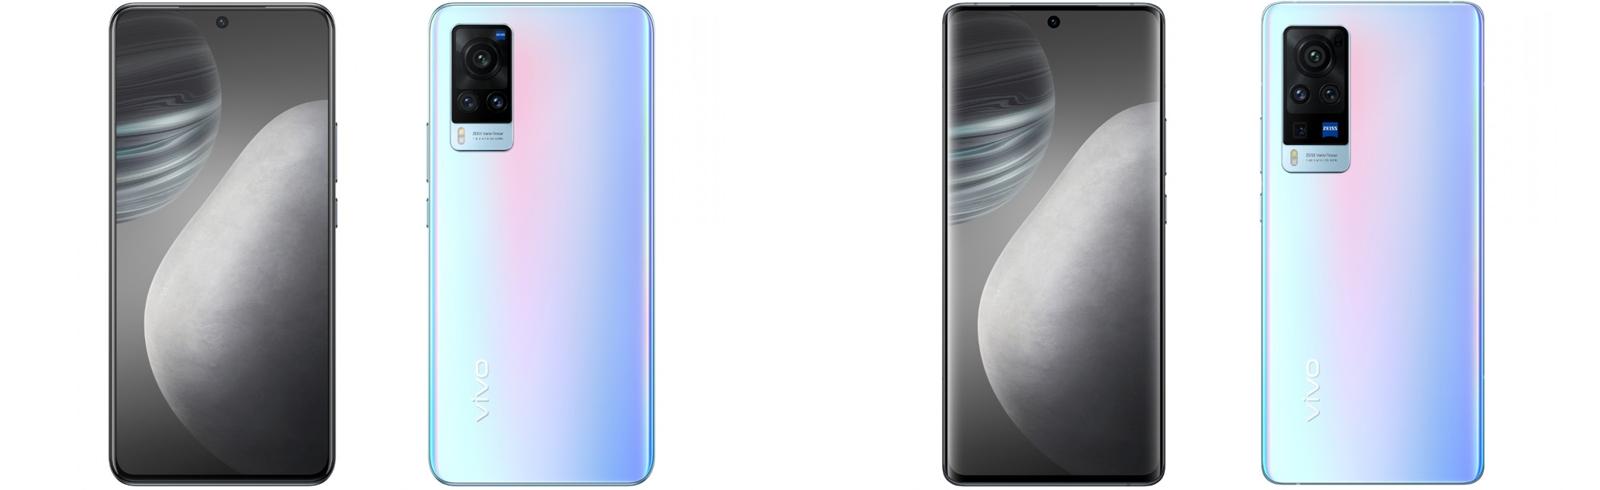 Vivo X60, Vivo X60 Pro, and Vivo X60 Pro+ will be presented on December 29